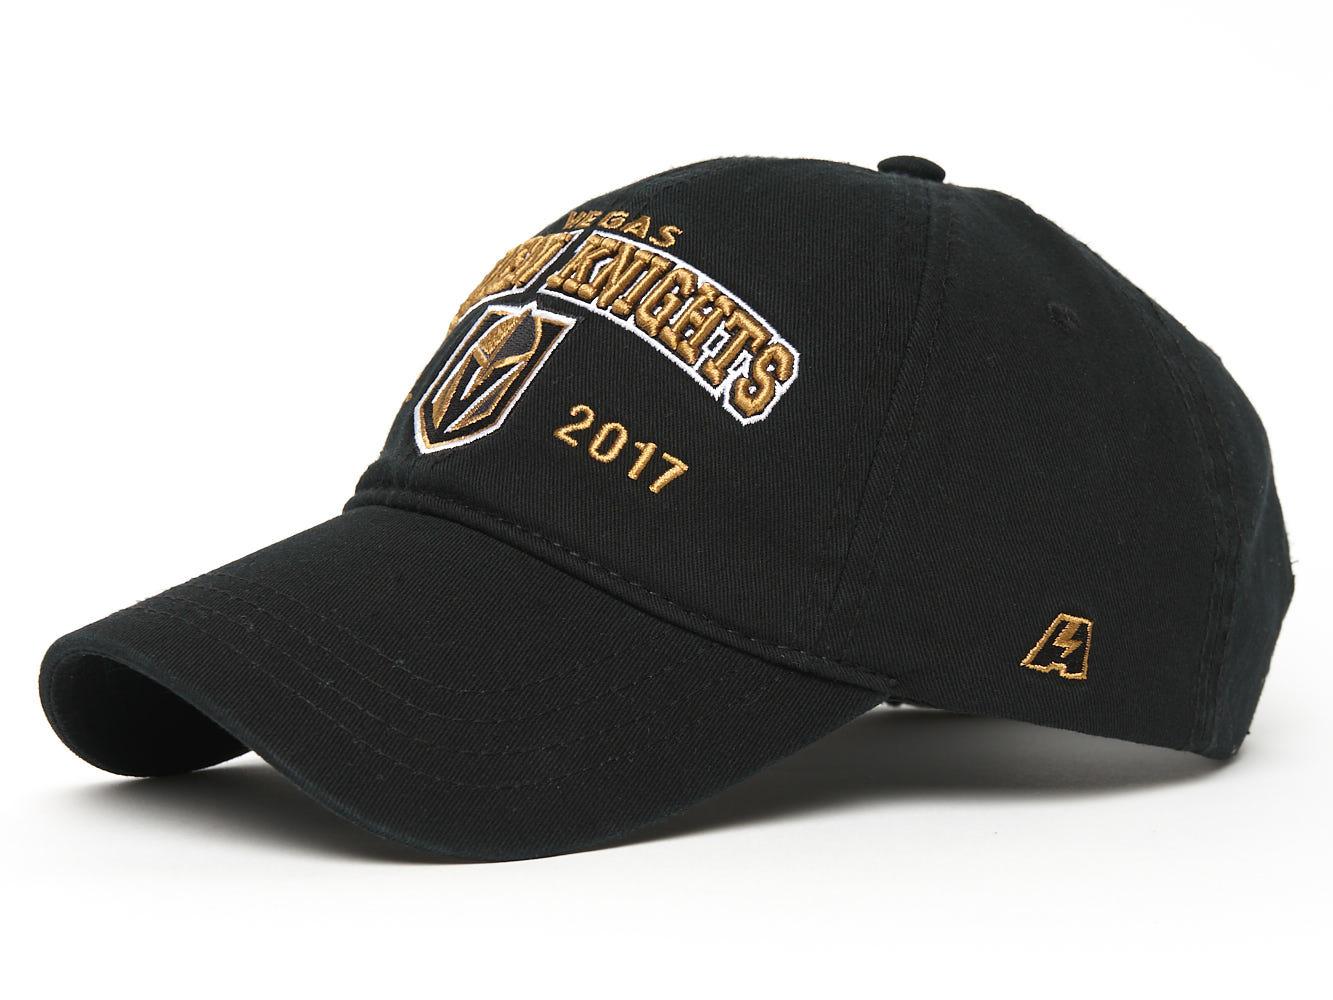 Бейсболка NHL Vegas Golden Knights est. 2017